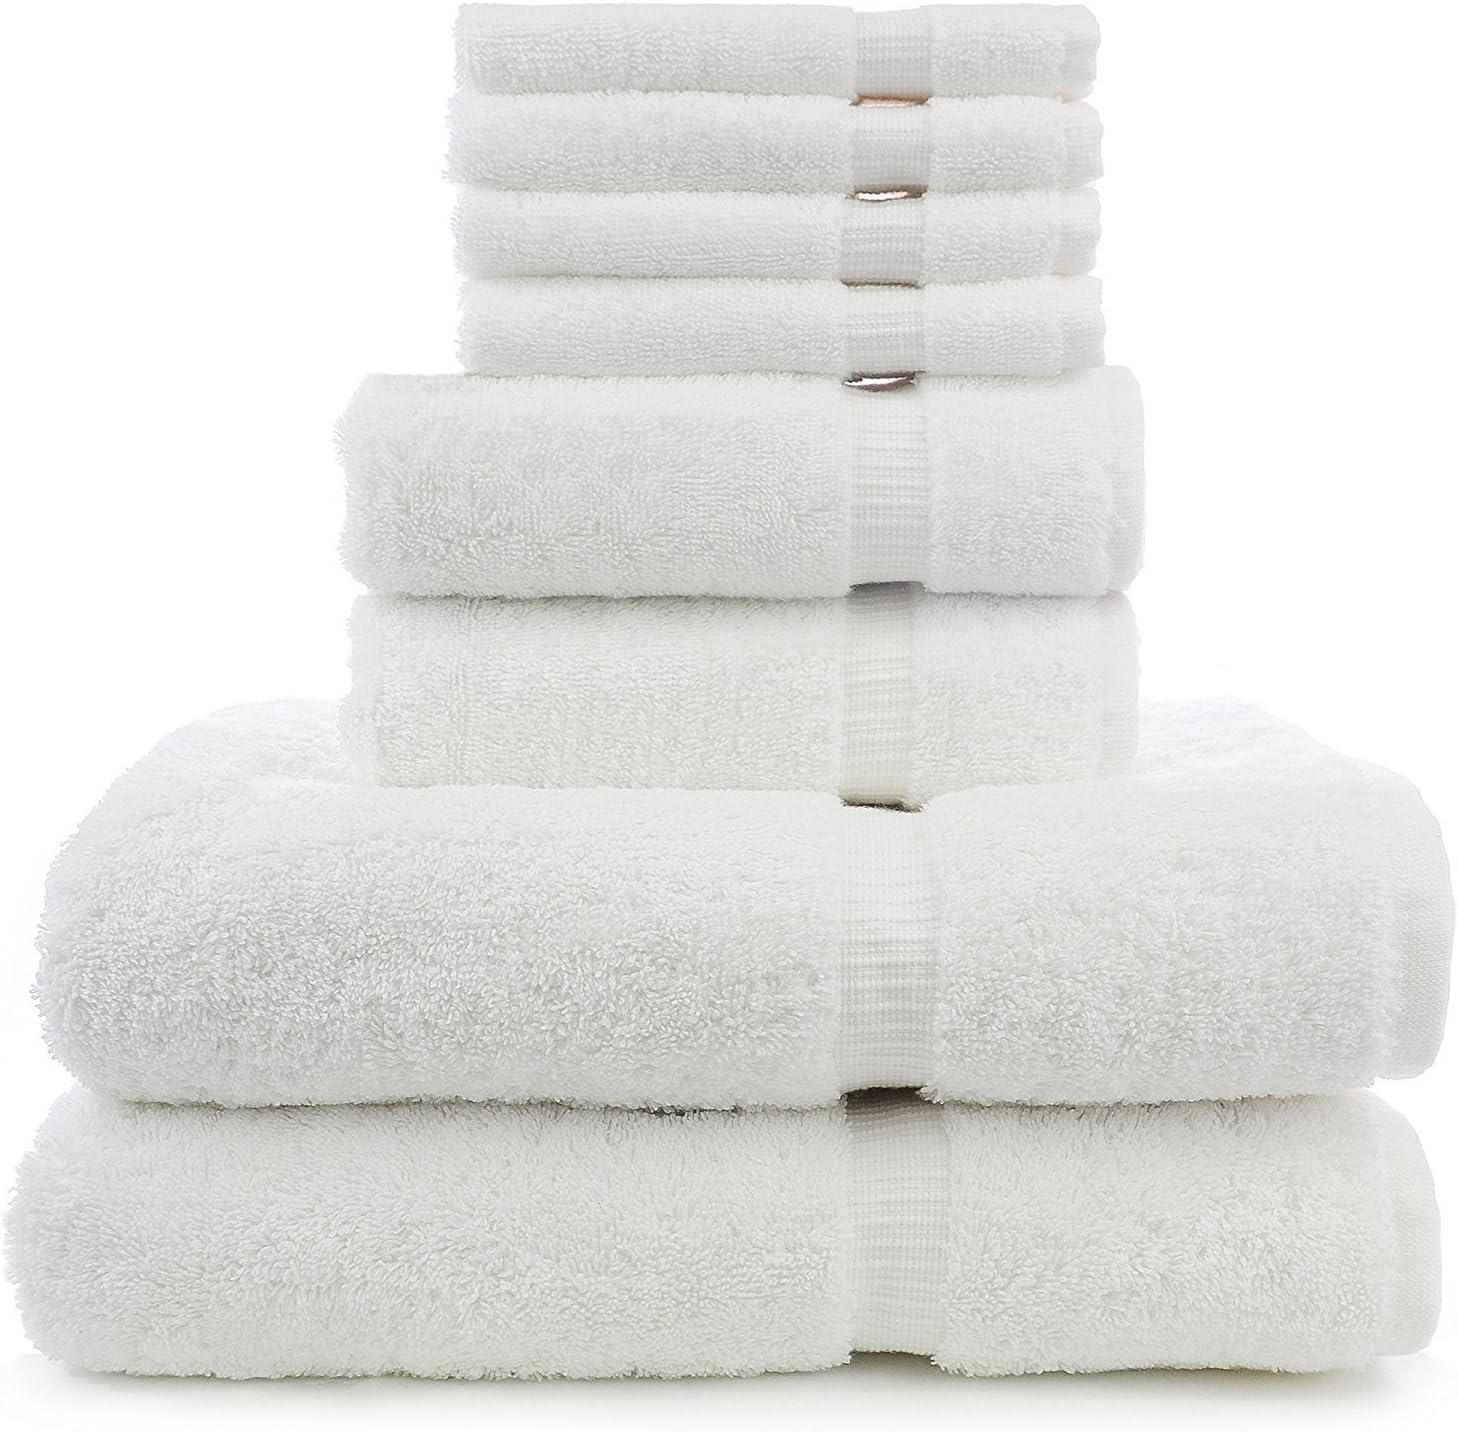 8 Piece Turkish Luxury Turkish Cotton Towel Set - Eco Friendly, 2 Bath Towels, 2 Hand Towels, 4 Wash Clothes by Turkuoise Turkish Towel (White) 81ZCZQzHkrL